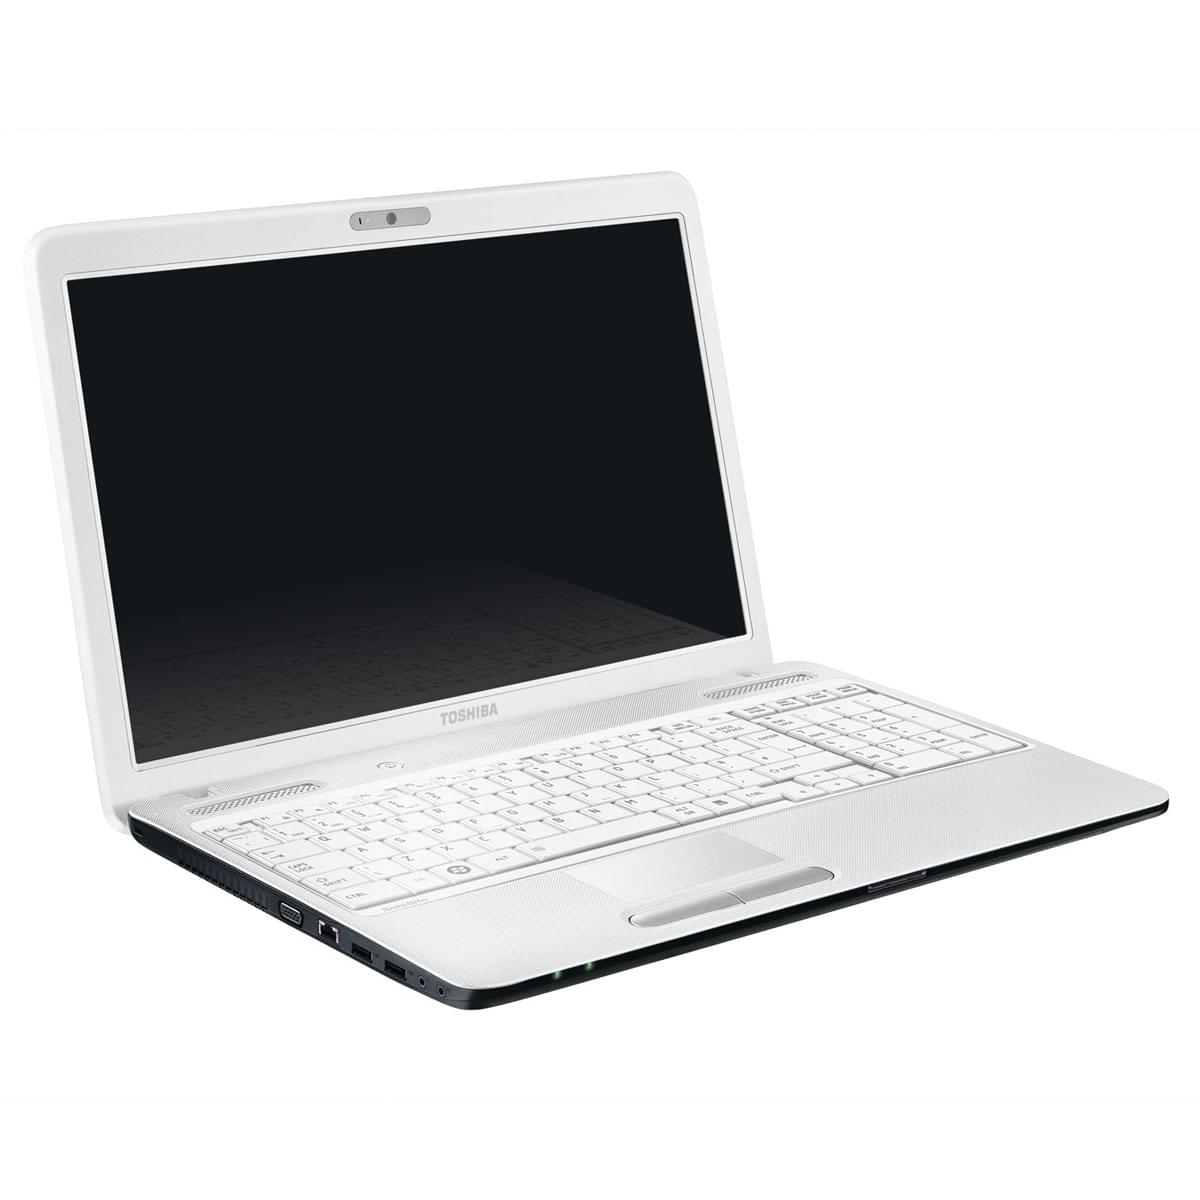 Toshiba PSC0QE-06R00DFR - PC portable Toshiba - Cybertek.fr - 0